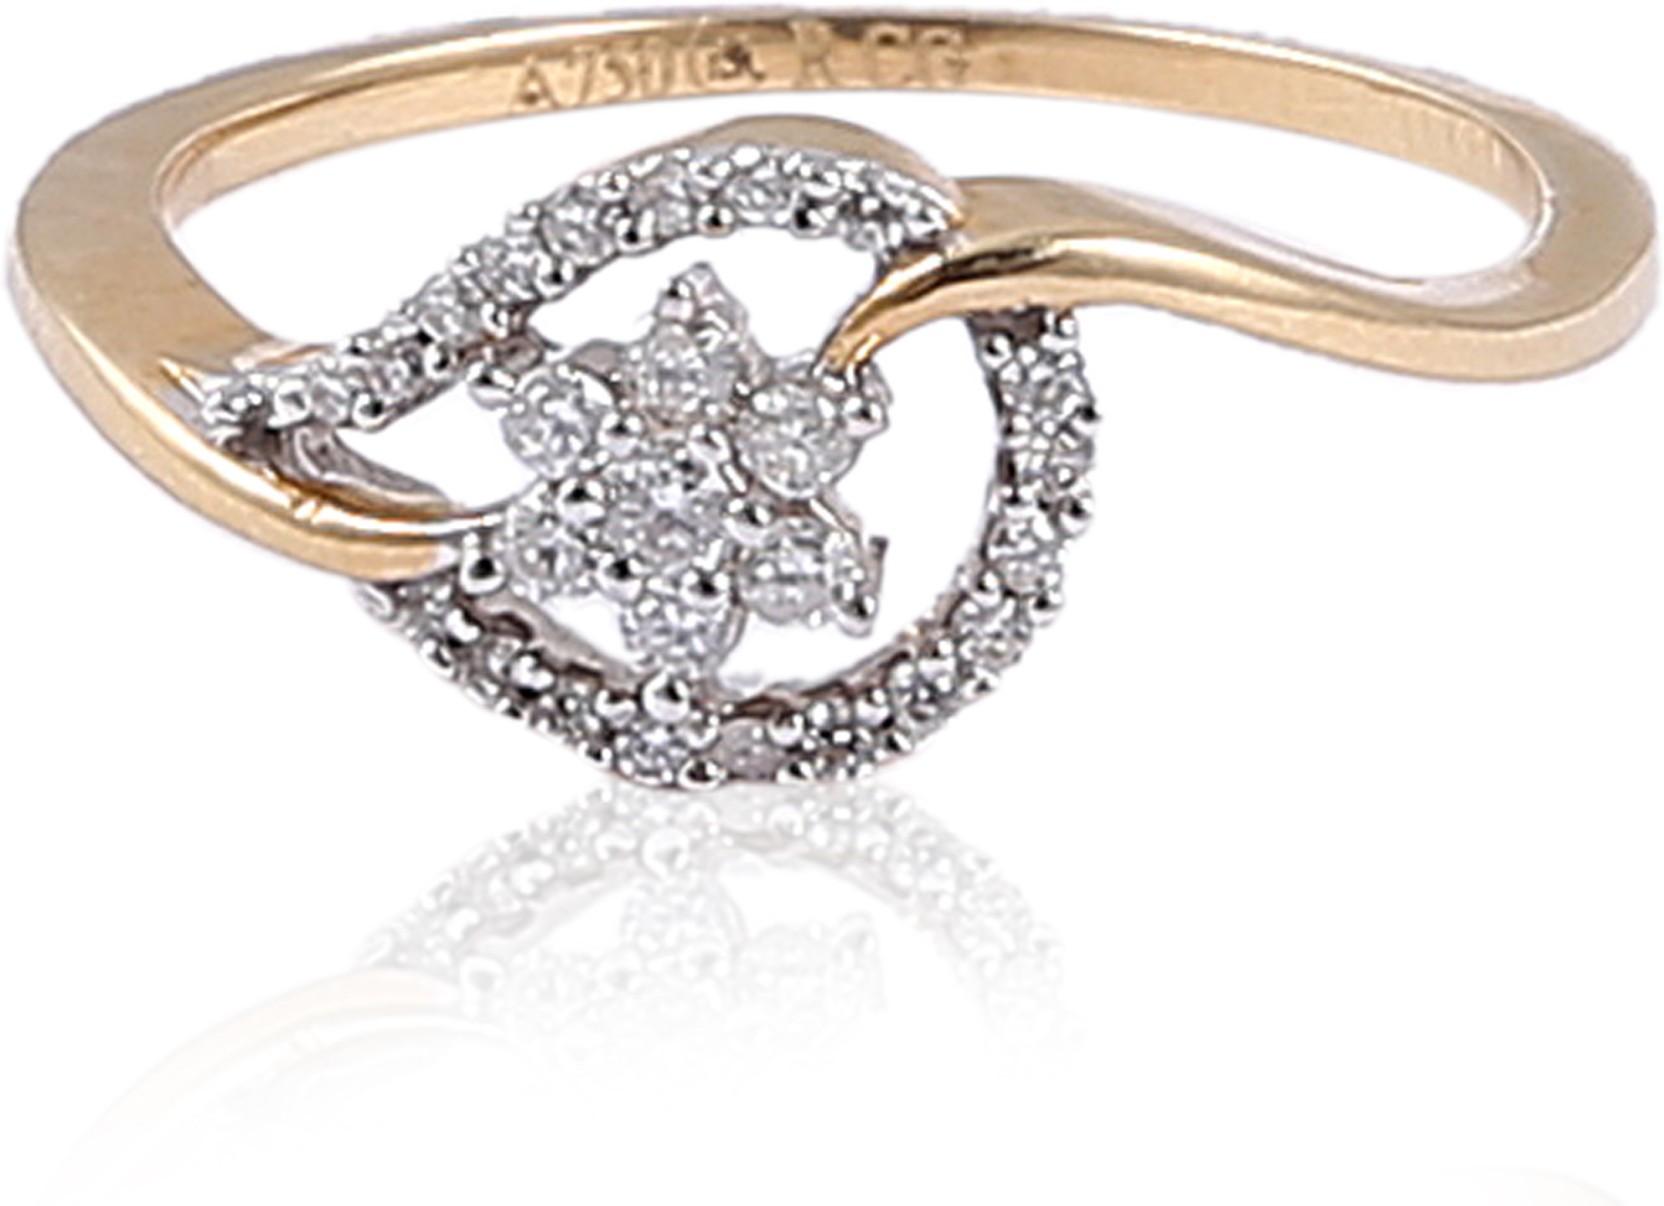 Jisha Romance Diamond Collection 14kt Yellow Gold ring Price in